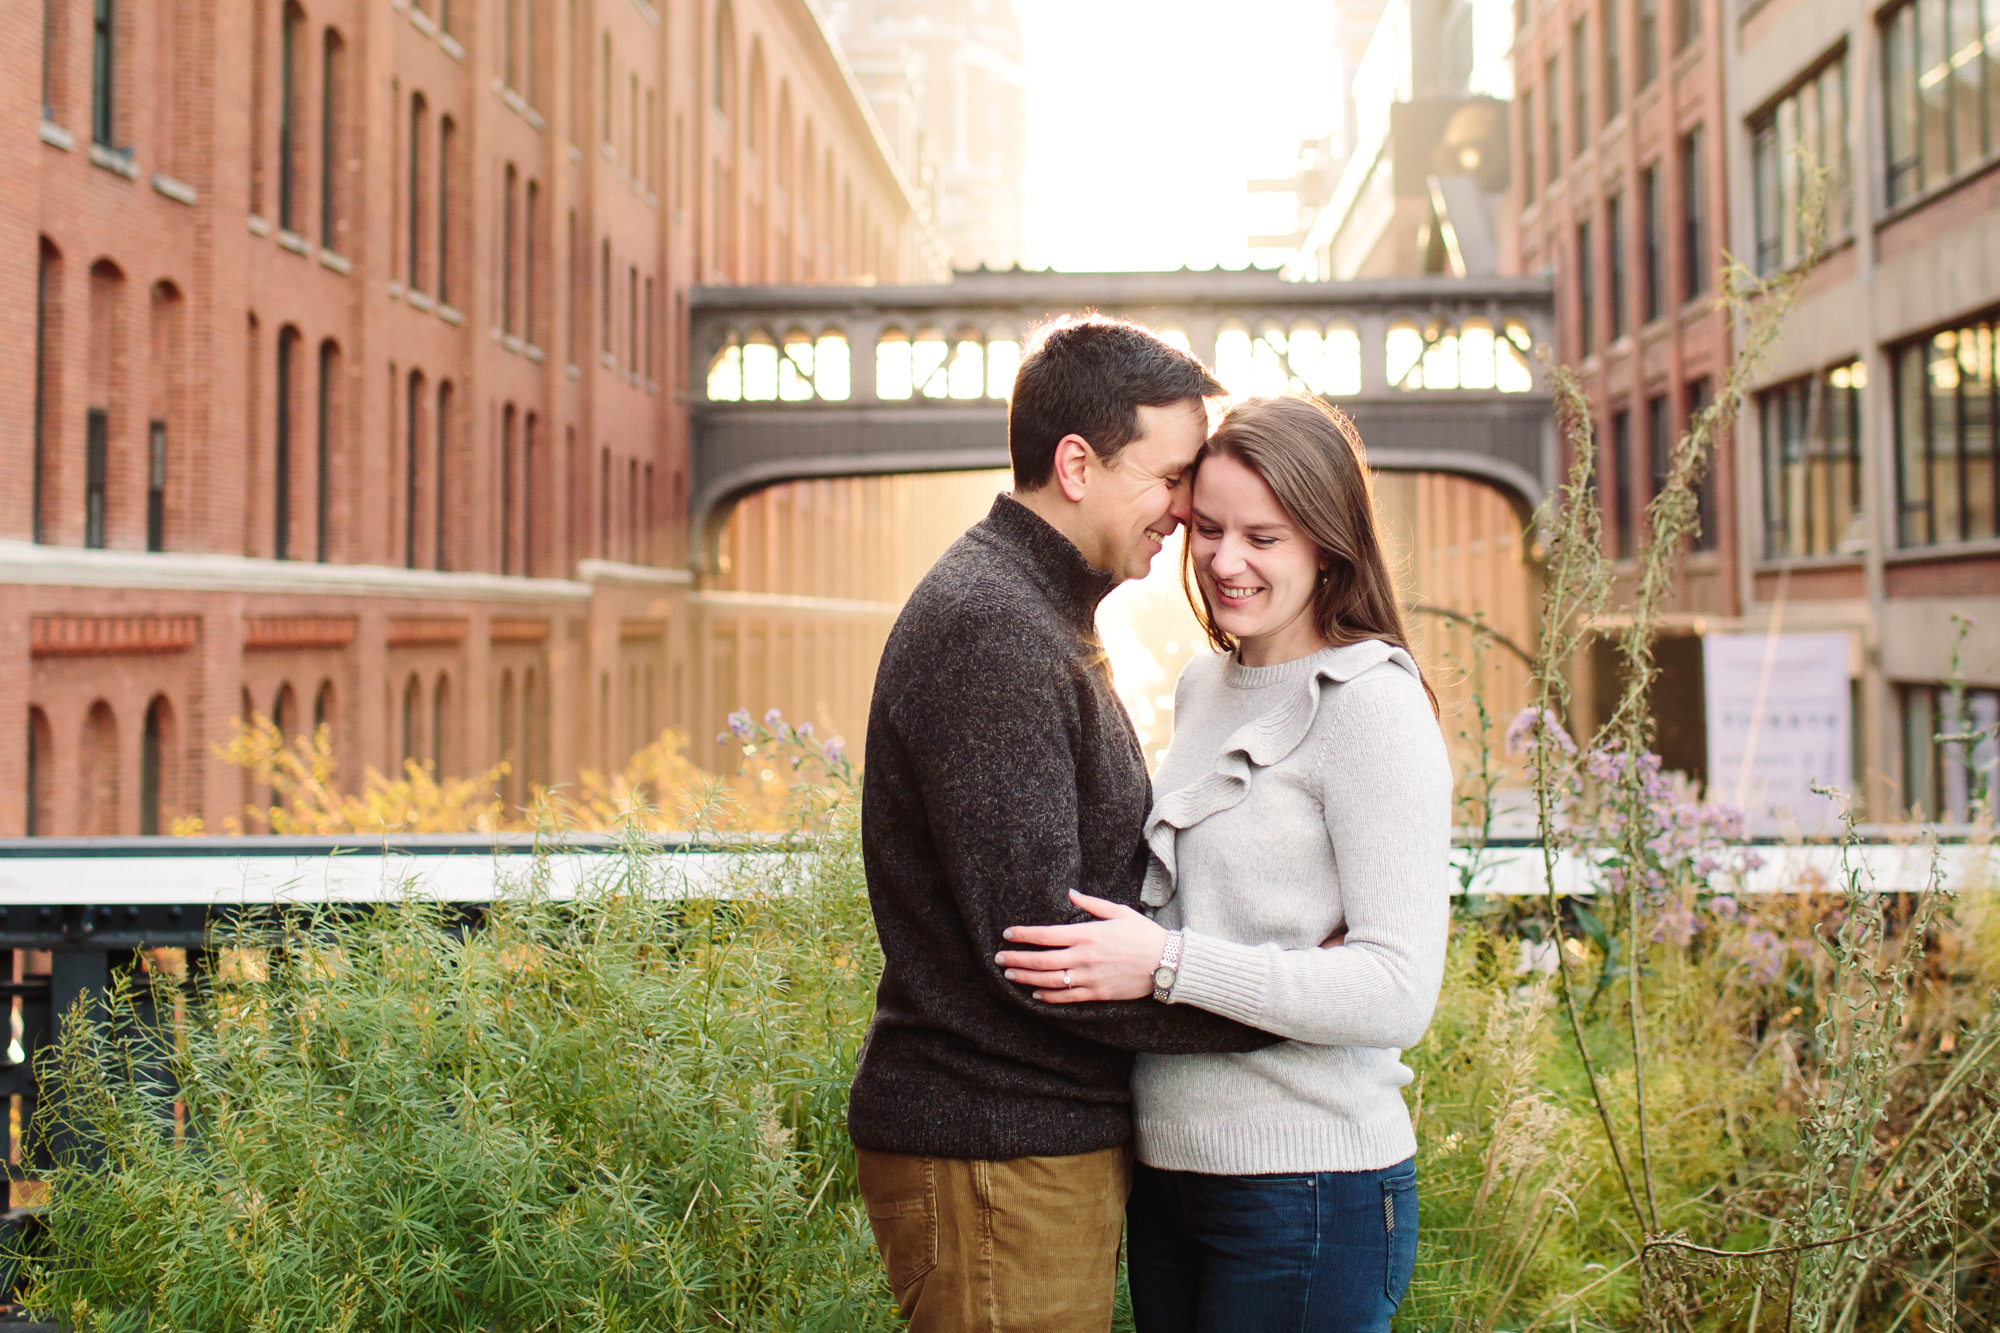 01_Sarah_Rob_The_Highline_New_York_City_Engagement_Photos_043.jpg